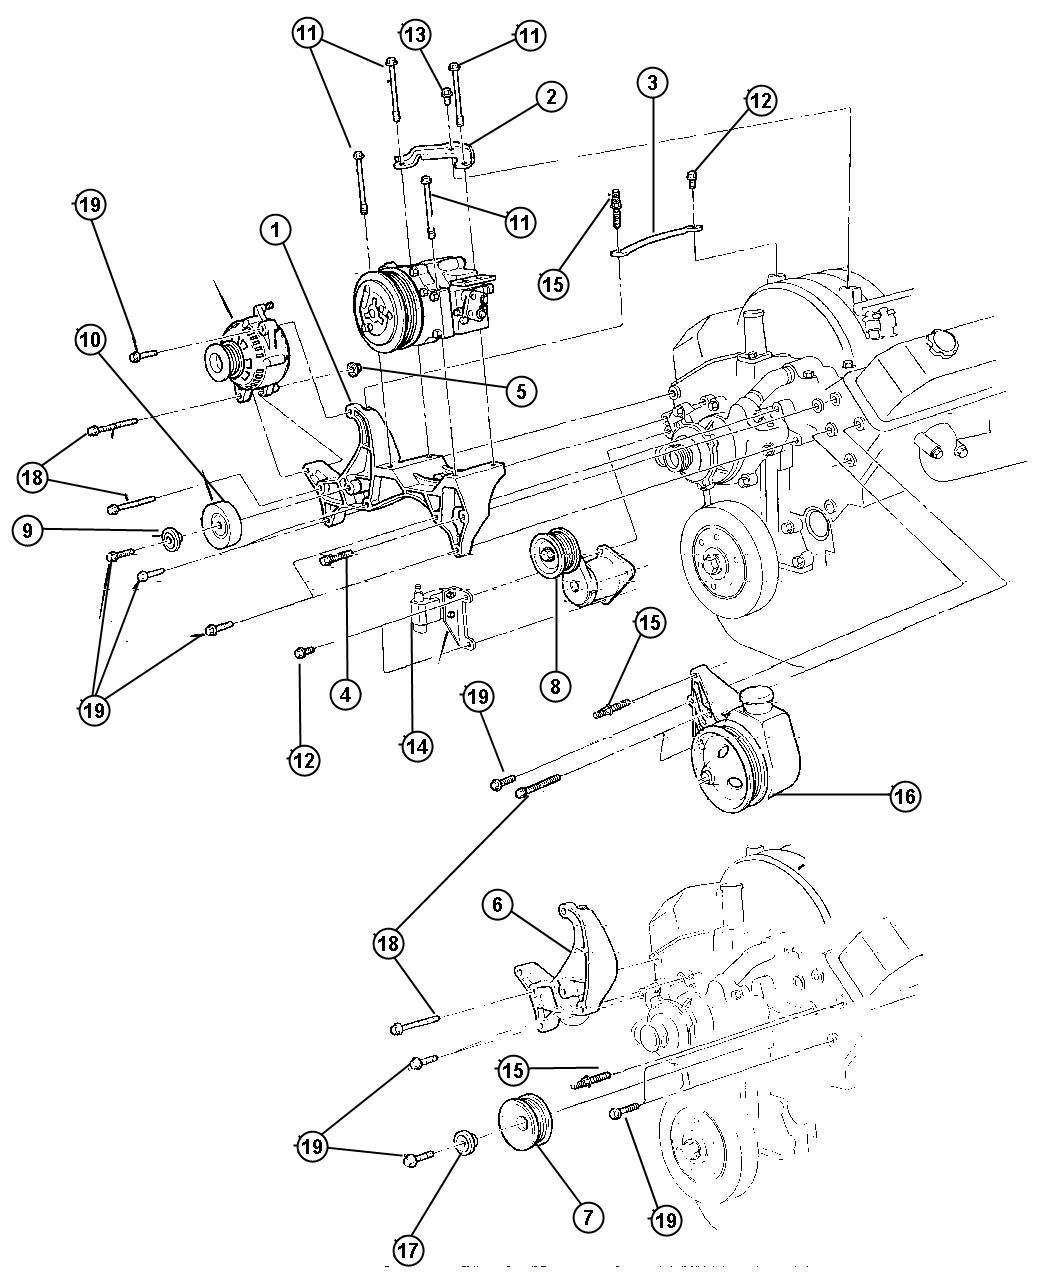 00i52673 Jeep Comp Alternator Wiring Diagram on jeep steering column diagram, jeep heater diagram, 1-wire alternator diagram, starter solenoid wiring diagram, 3 wire alternator diagram, alternator connections diagram, jeep cherokee alternator, jeep exhaust diagram, jeep voltage regulator diagram, 4 wire alternator diagram, jeep alternator generator, jeep alternator connector, jeep starter relay, jeep wrangler alternator, jeep parts, jeep alternator repair, jeep starter diagram, jeep seat belt diagram, jeep electrical diagram, alternator schematic diagram,